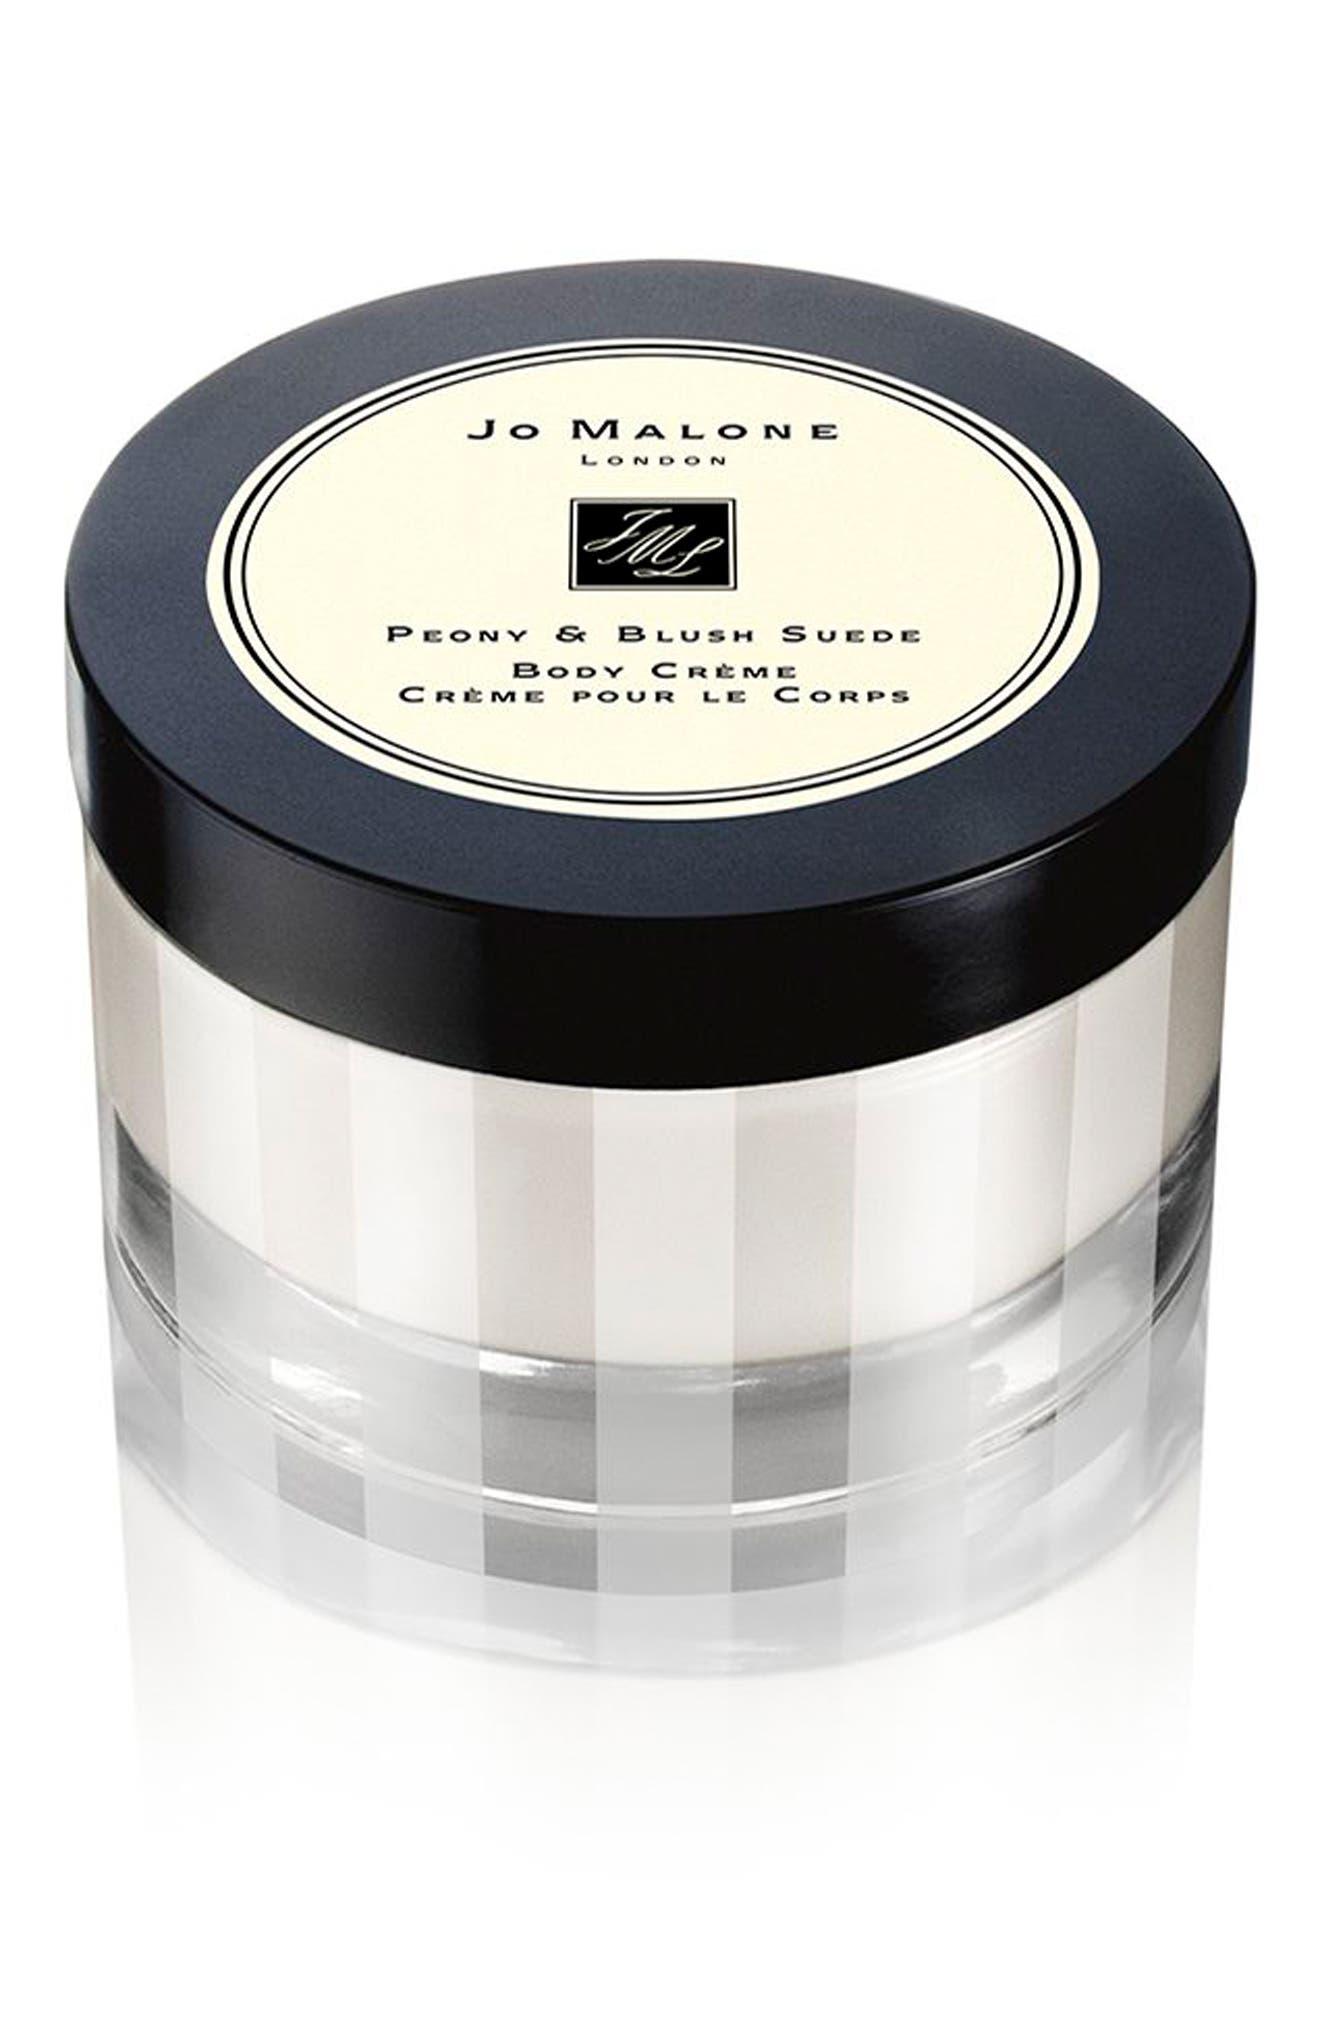 Jo Malone London™ Peony & Blush Suede Body Crème